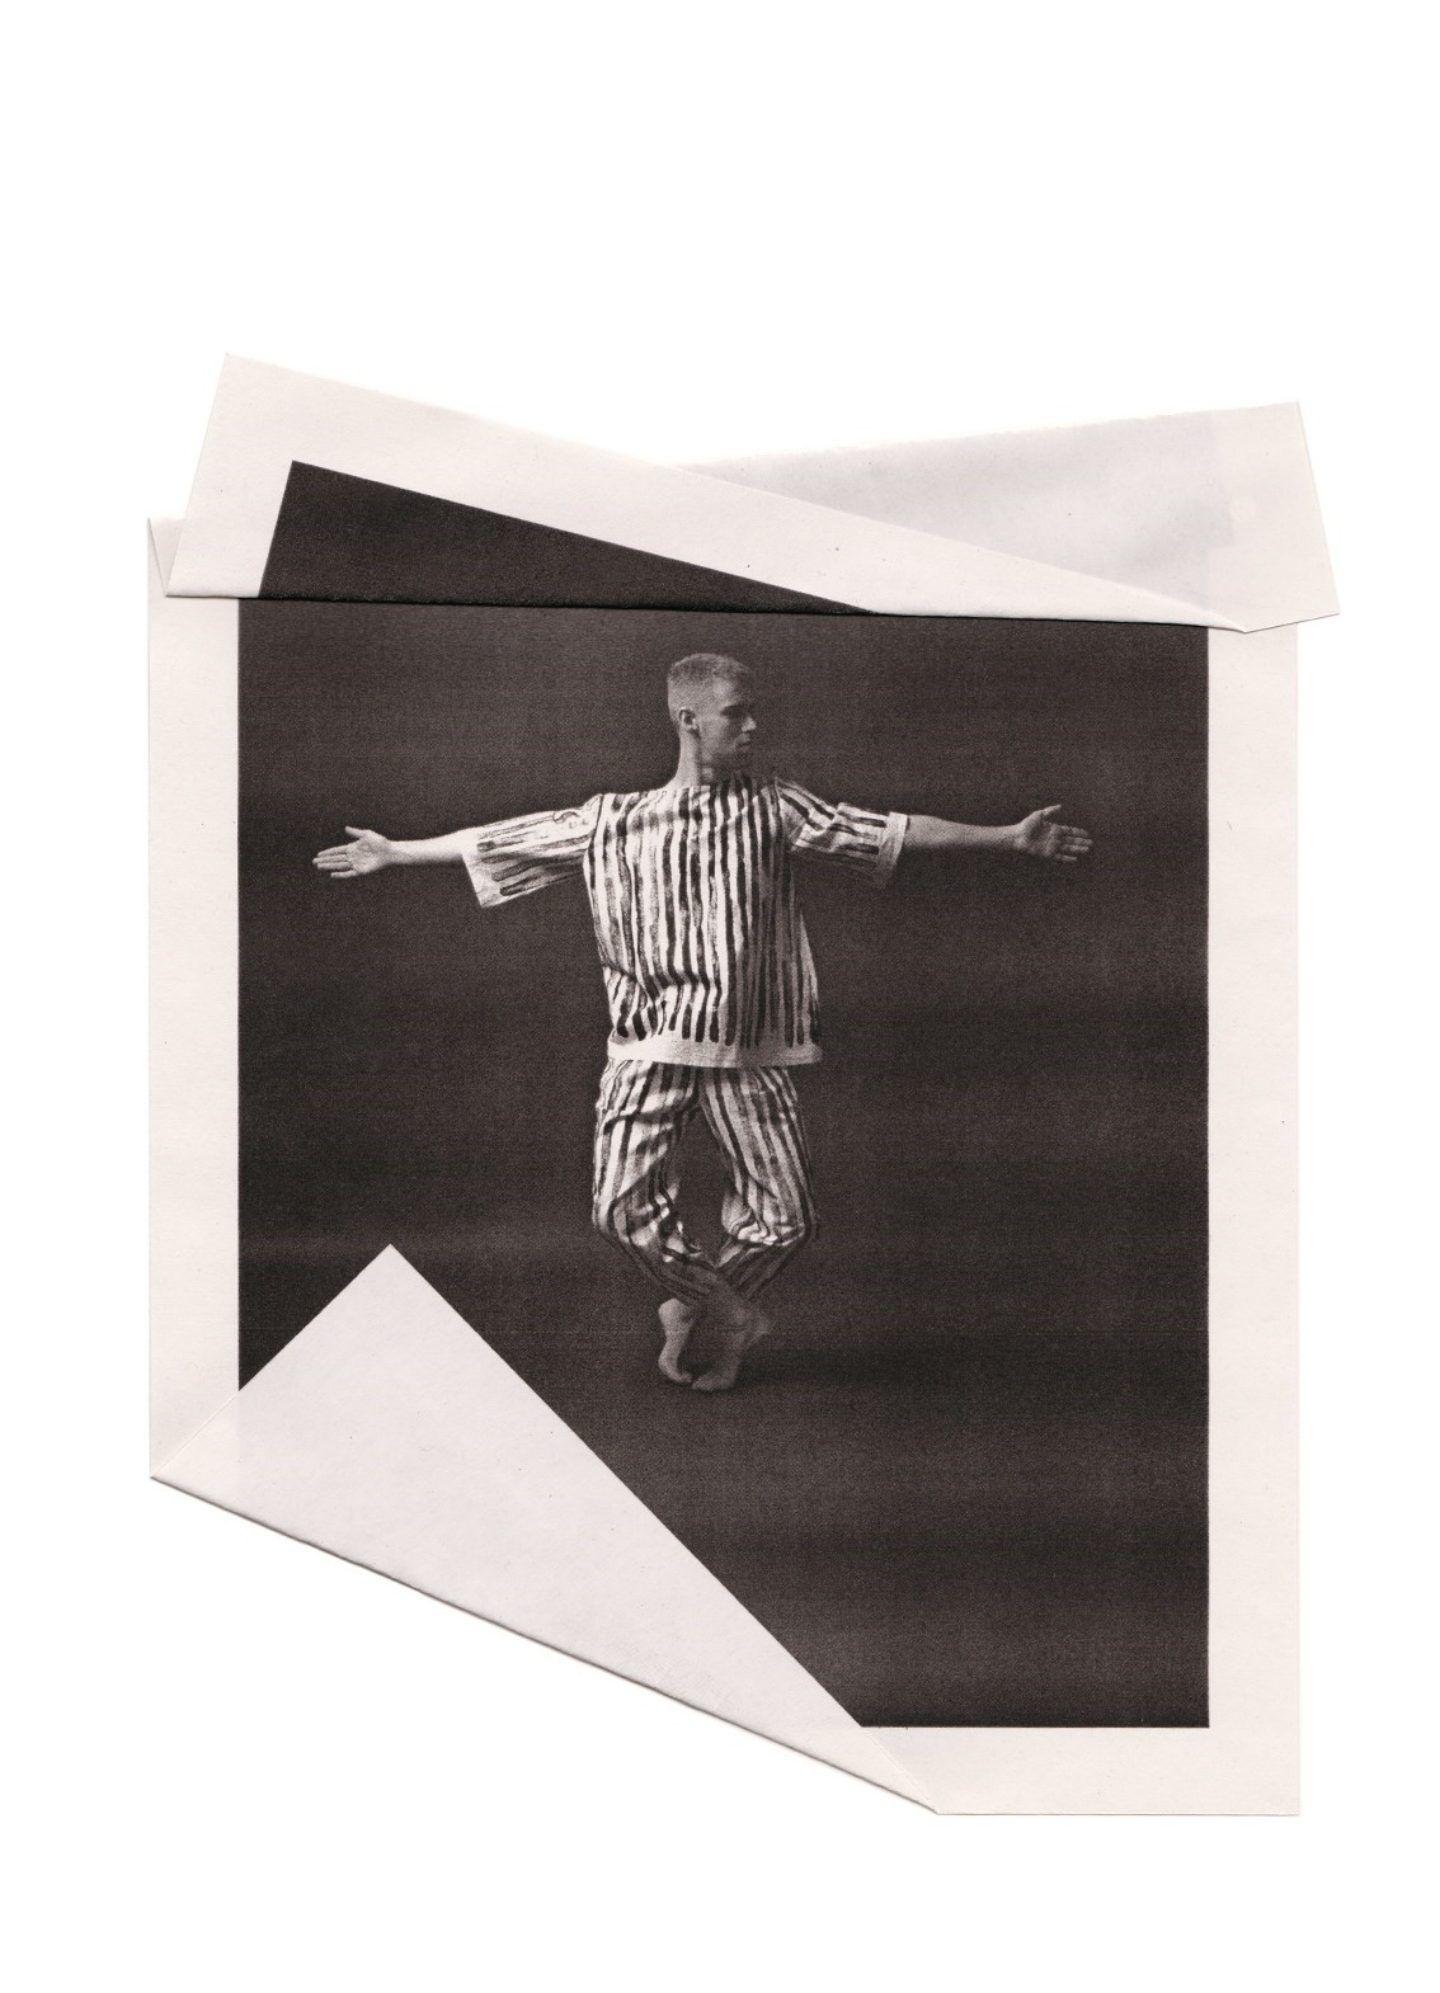 IGNANT-Art-Paul-Phung-Bruce-Usher-Dance-11